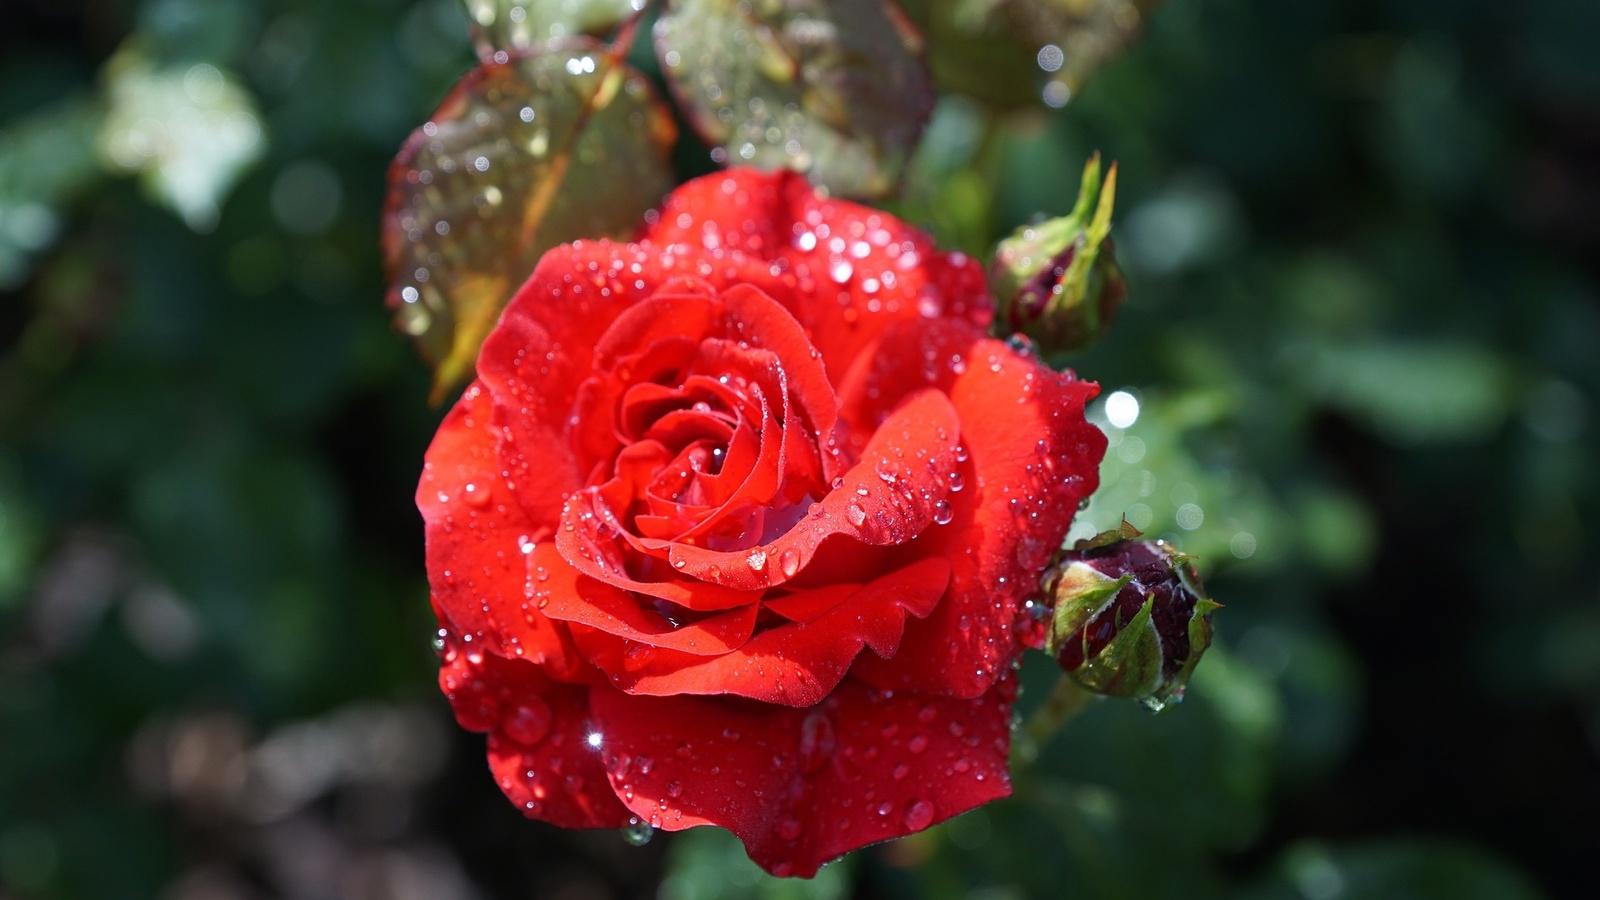 макро, роза, капли, вода, цветок, бутон